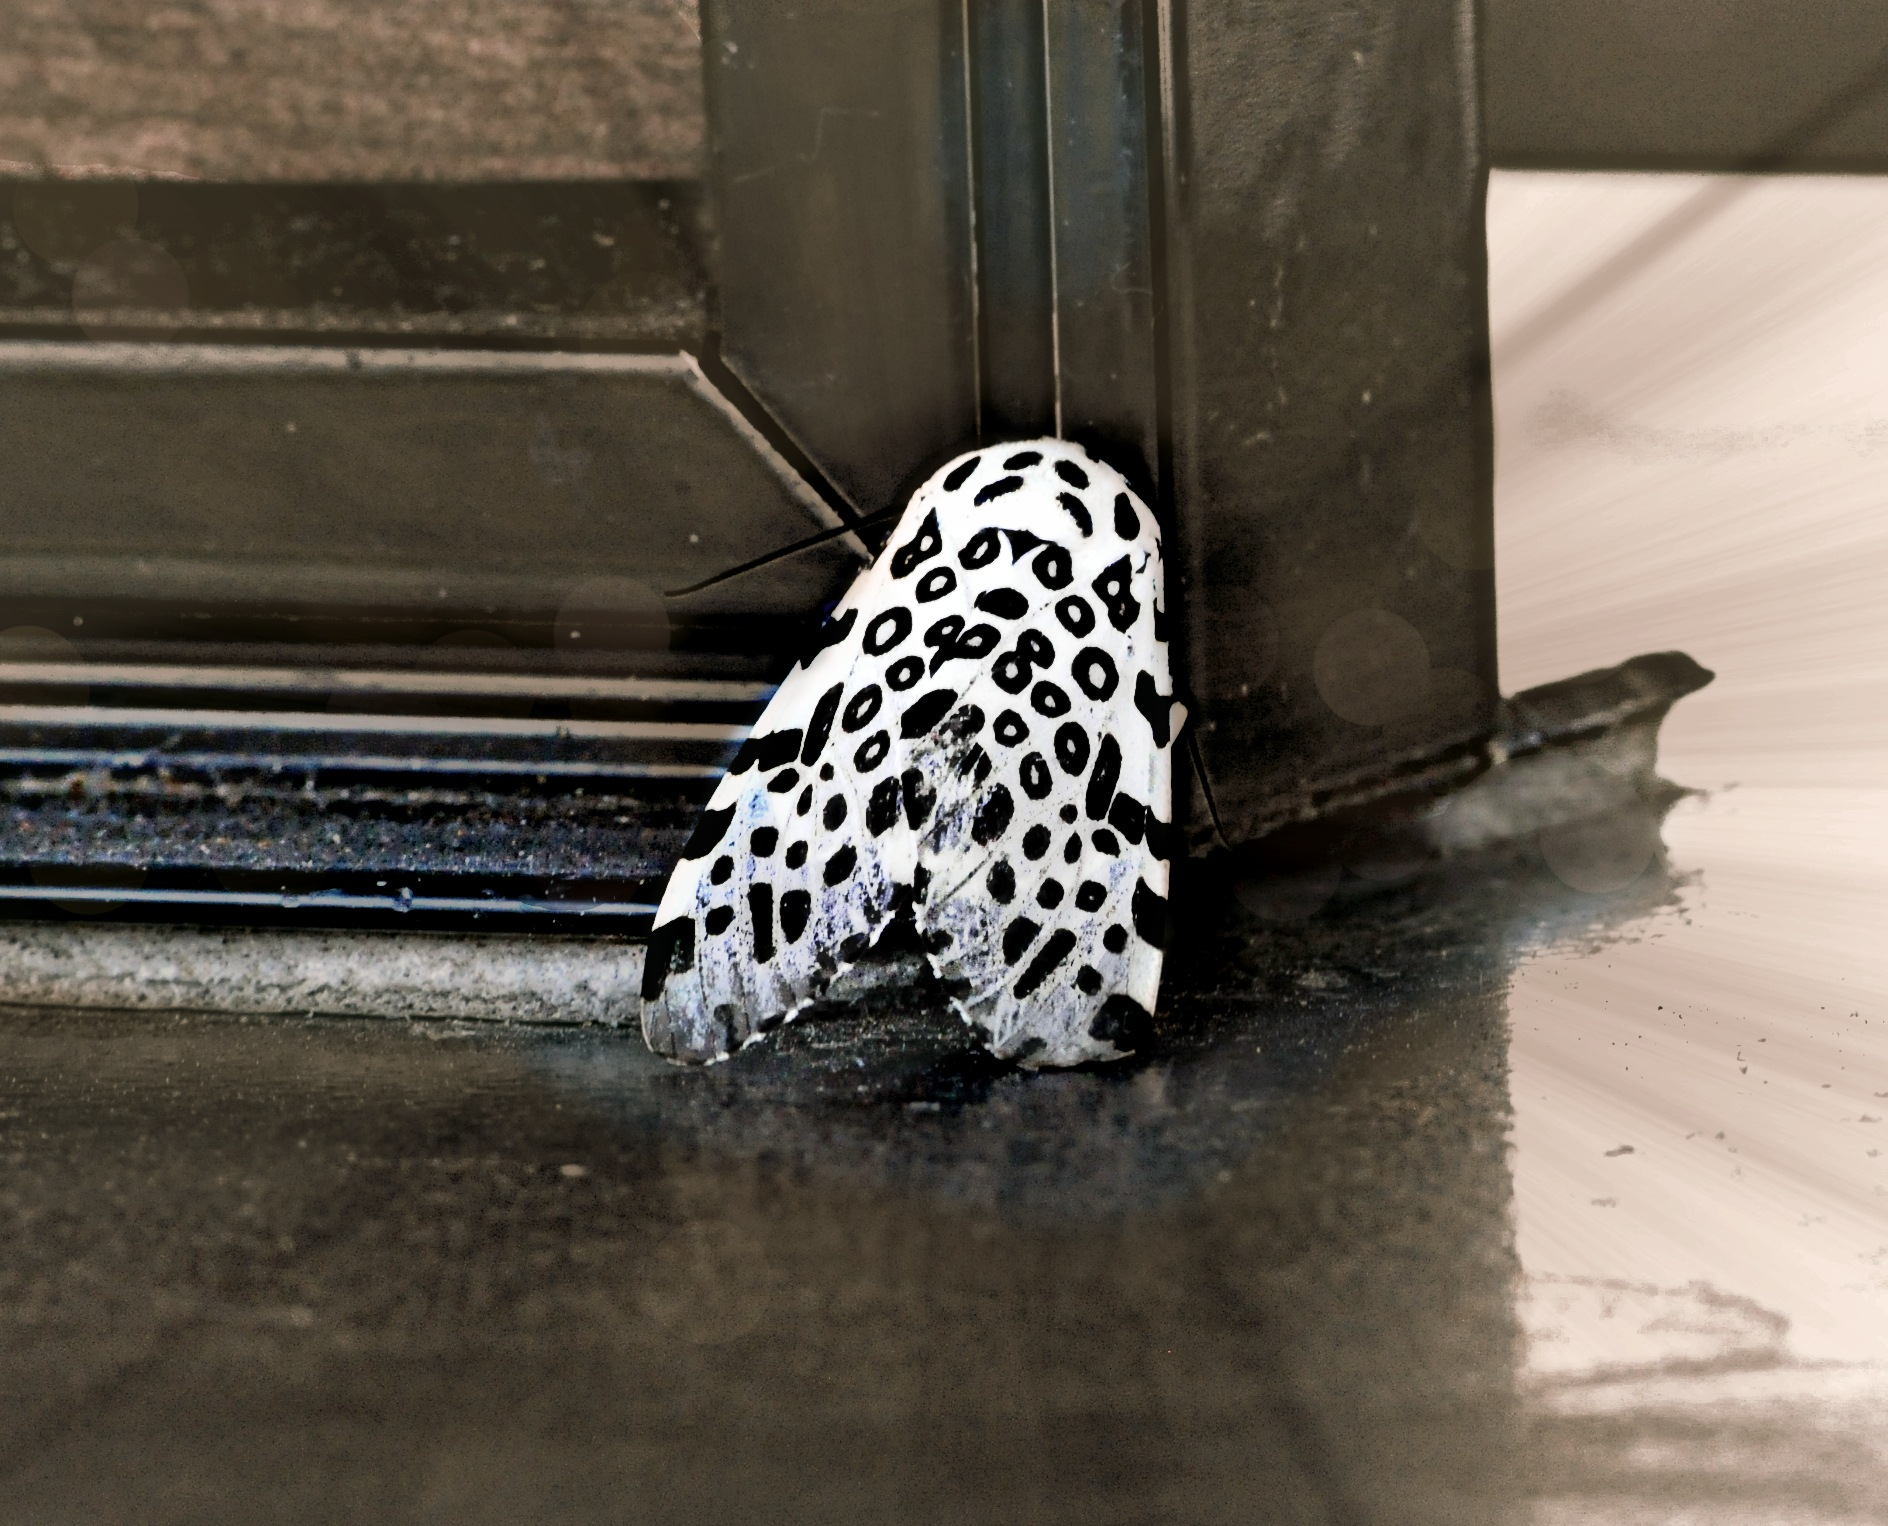 Leopard Moth by Tom Horonzy